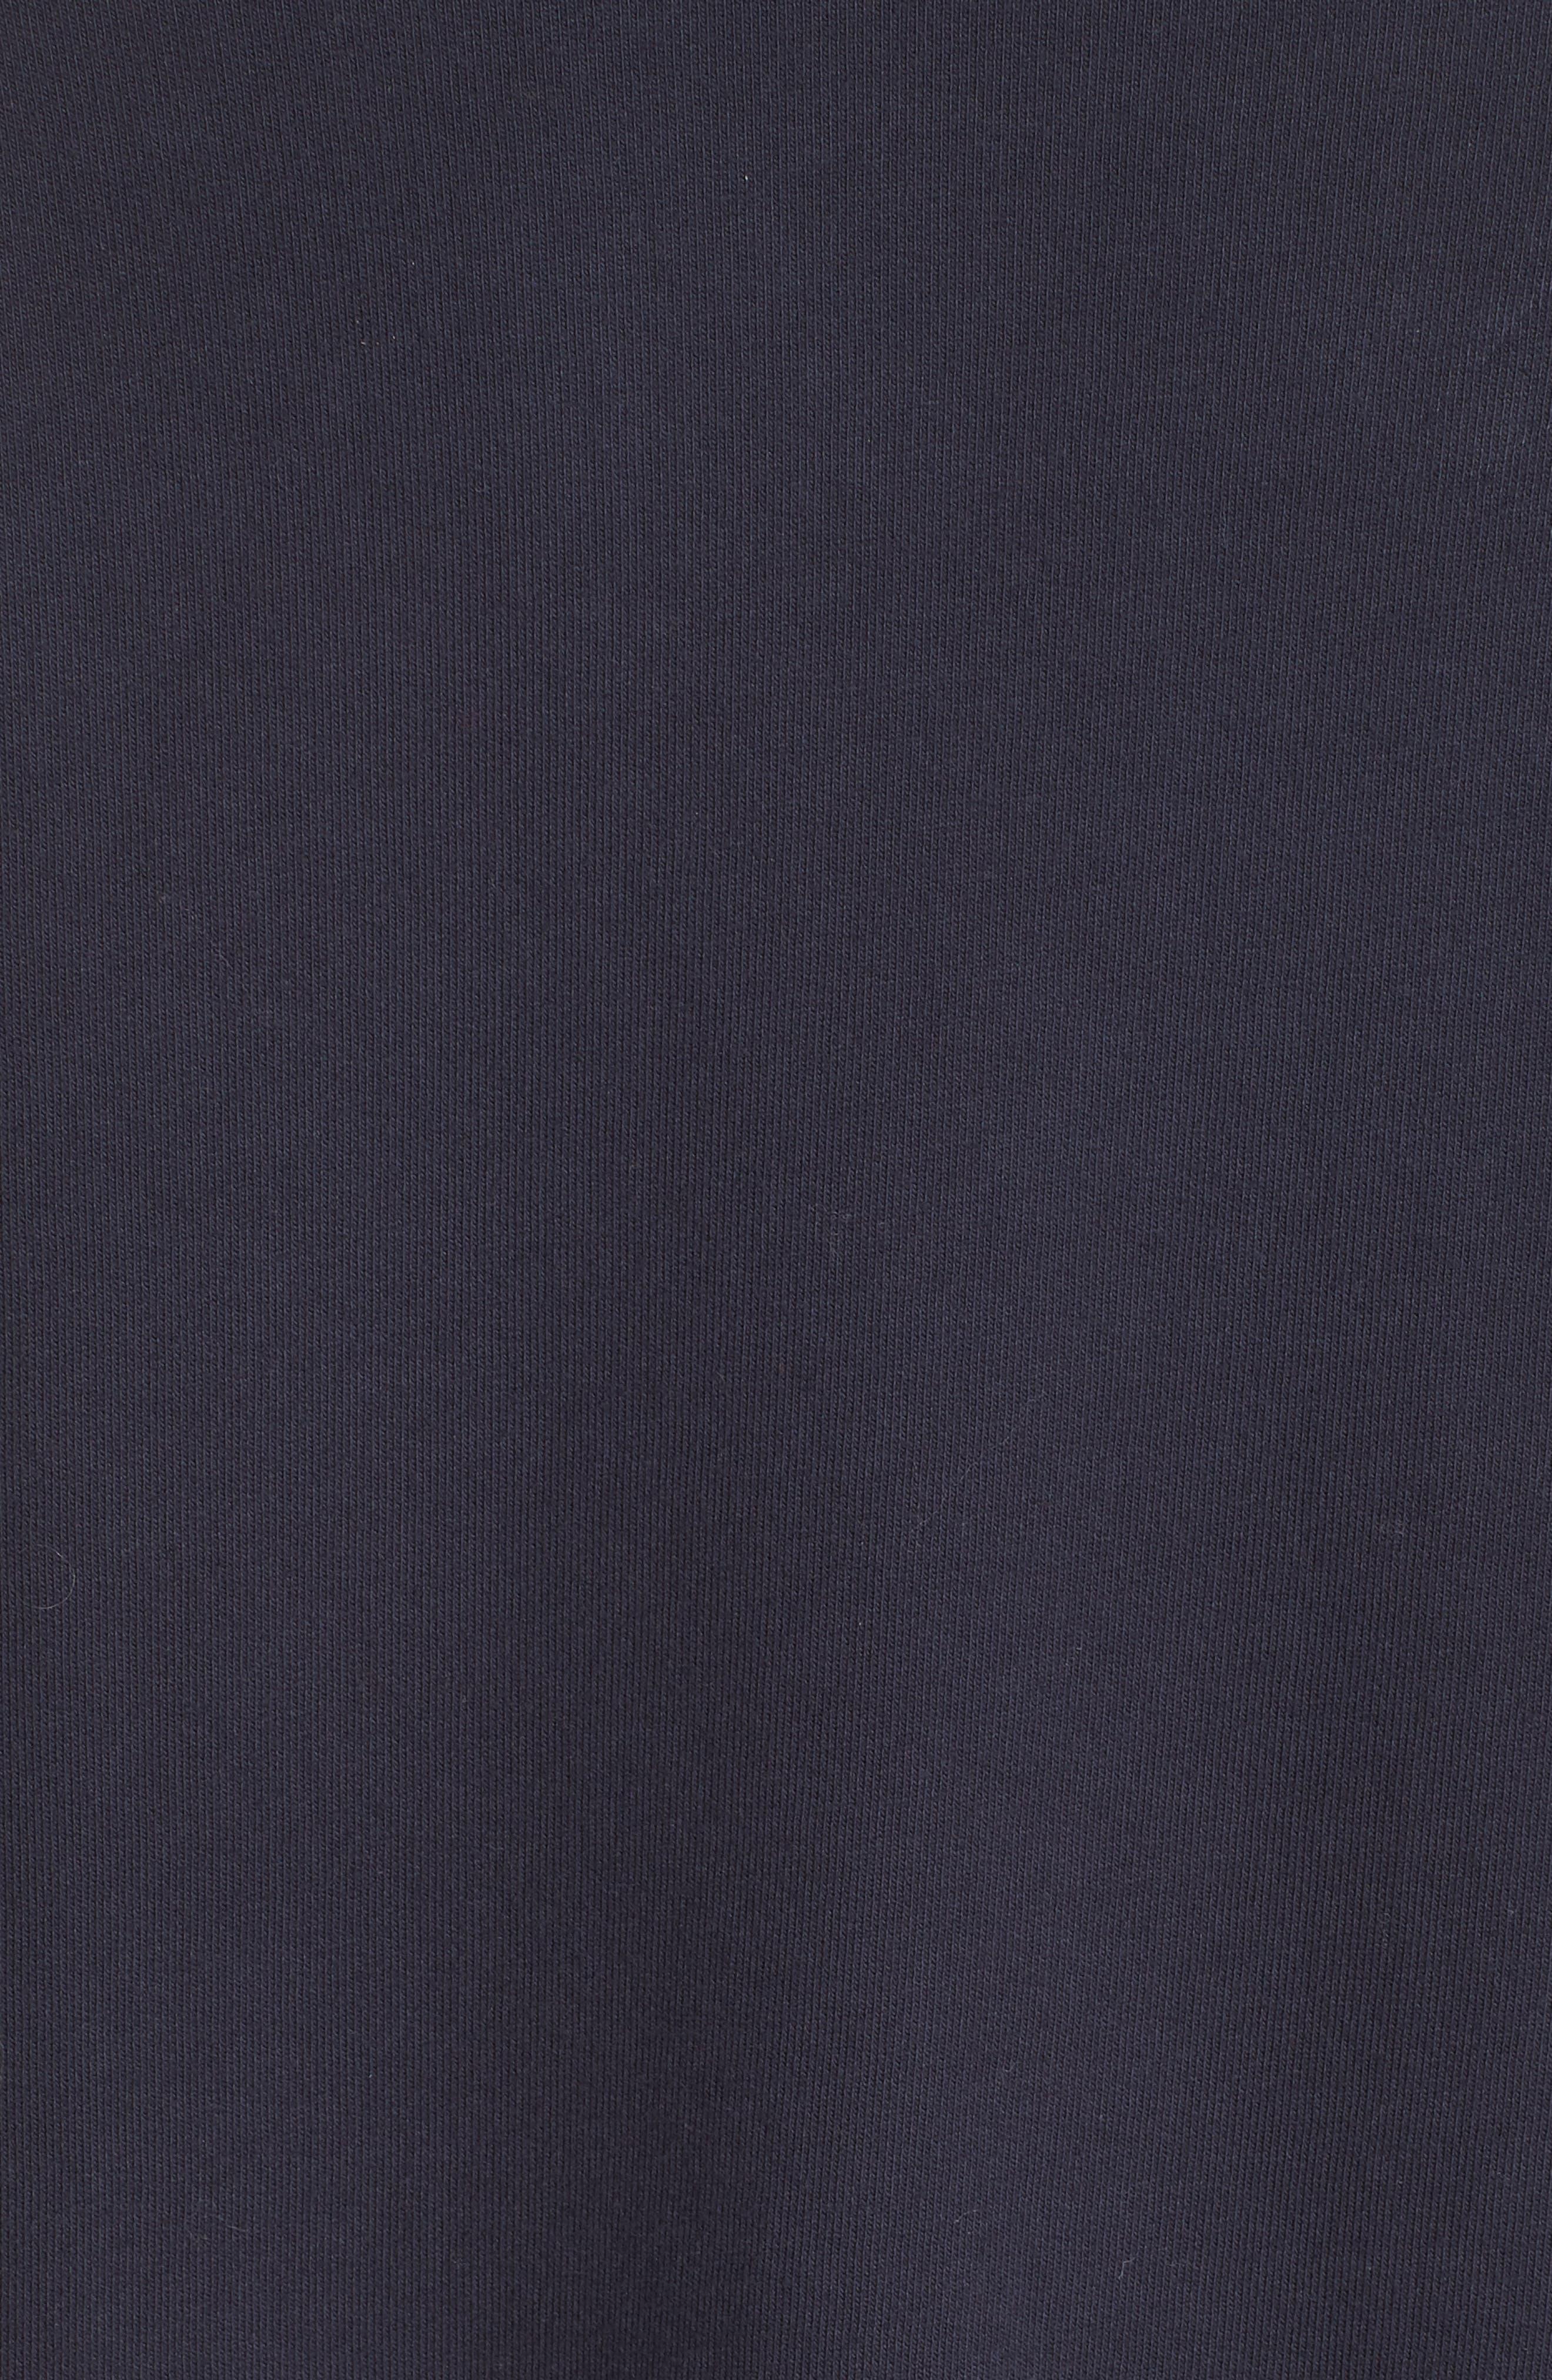 Bow Colorblock Sweatshirt,                             Alternate thumbnail 5, color,                             NAVY